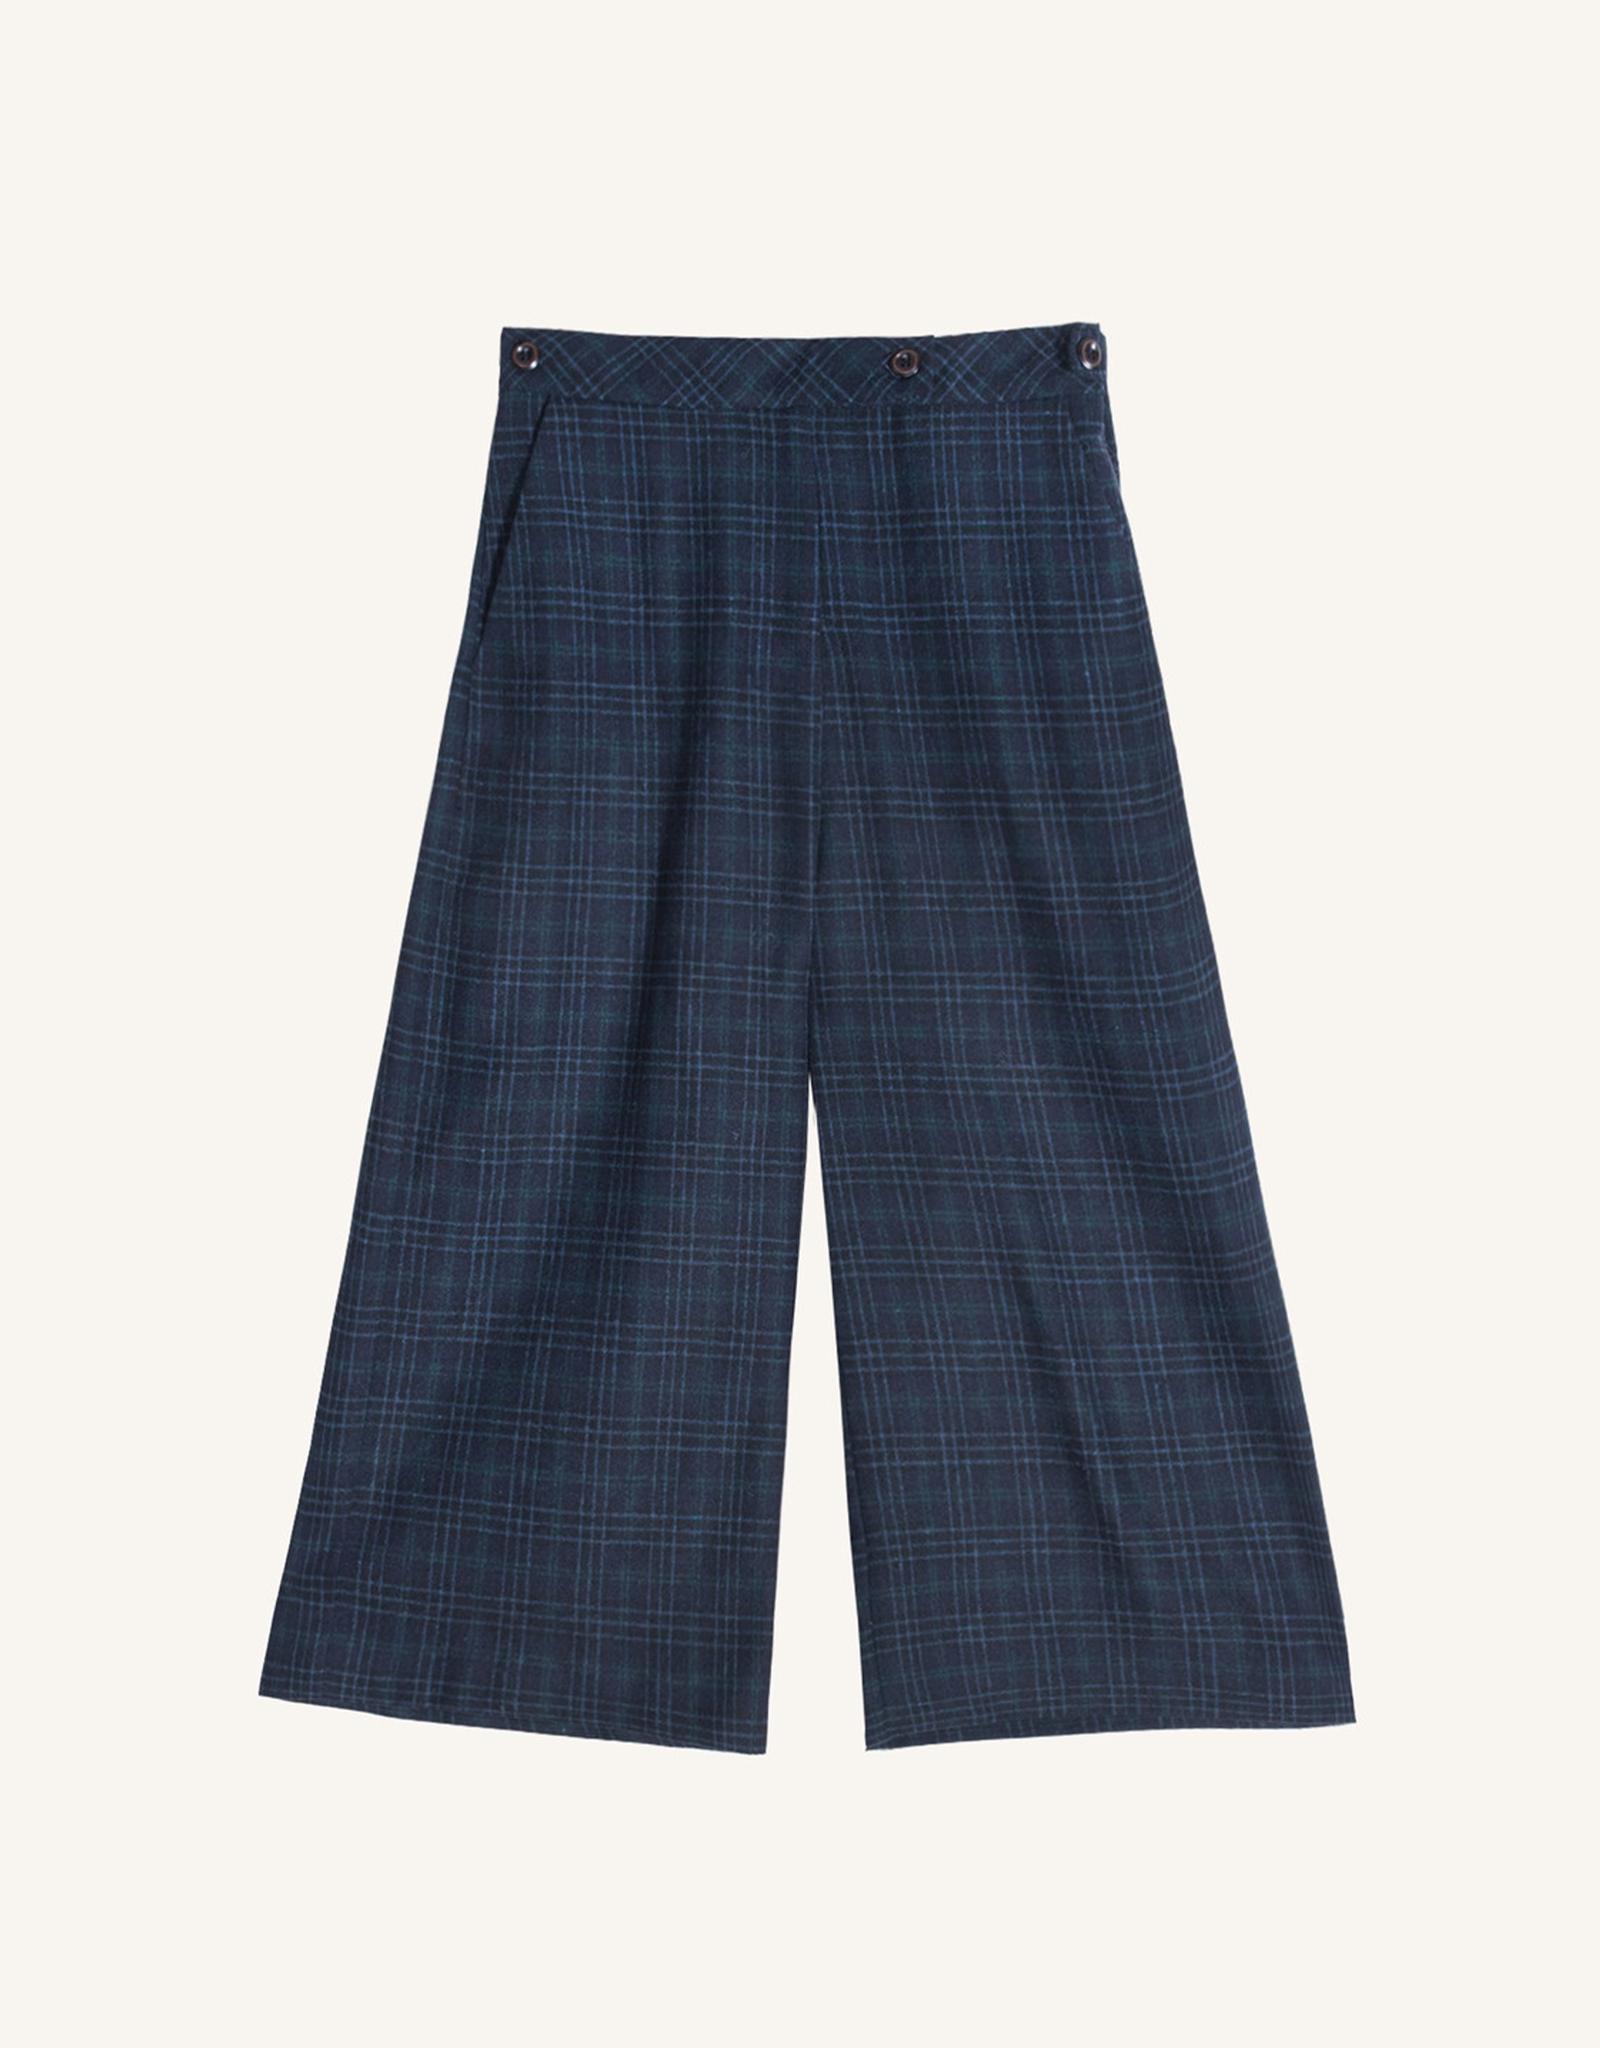 FRNCH FRNCH - Pham Pantalon